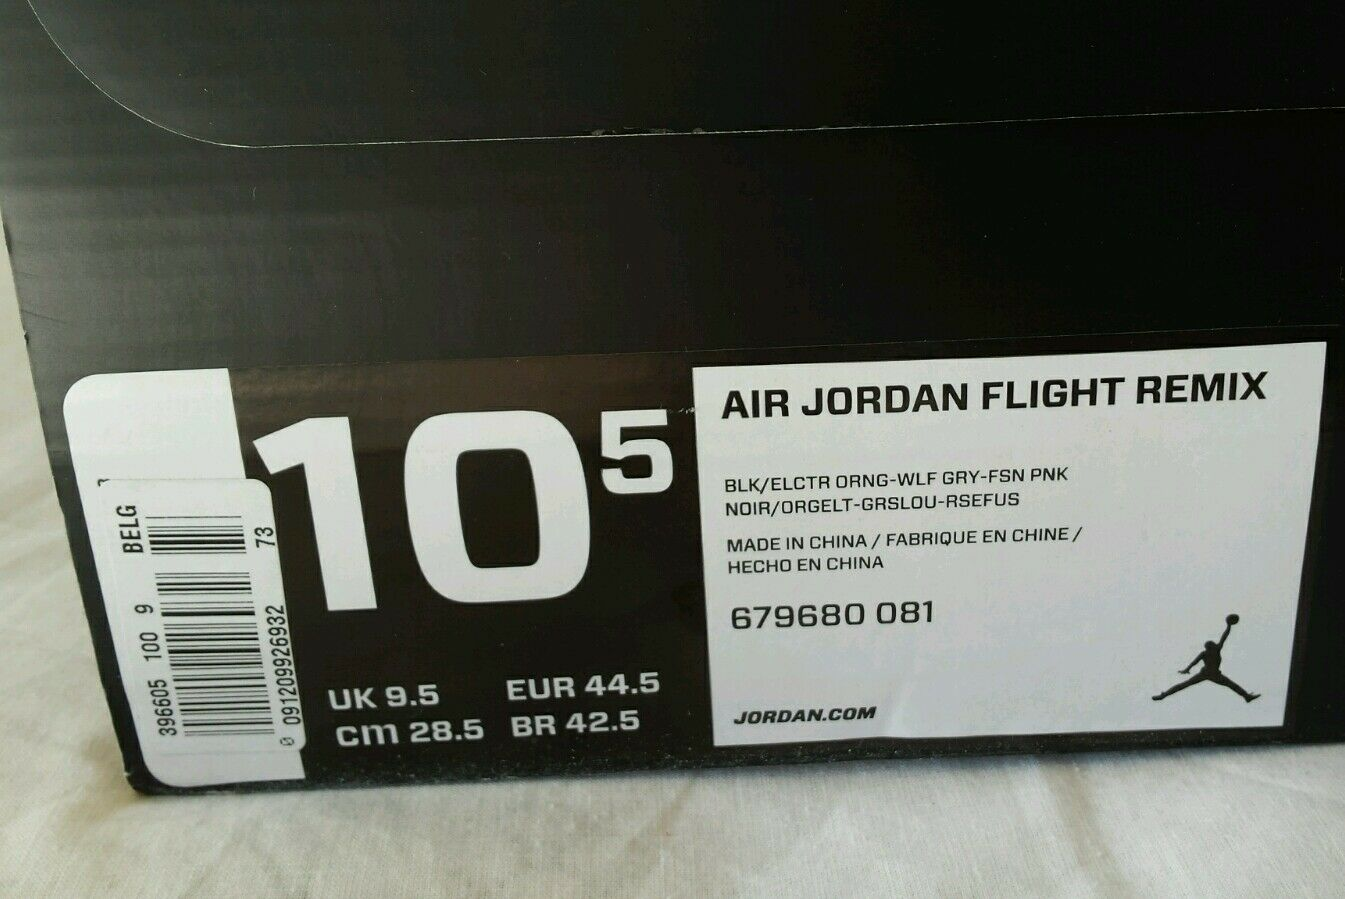 NIKE AIR JORDAN 16 FLIGHT SPETTACOLO REMIX N.44,5 NERA SPETTACOLO FLIGHT DA COLLEZIONE OKKSPORT 97 c843c3